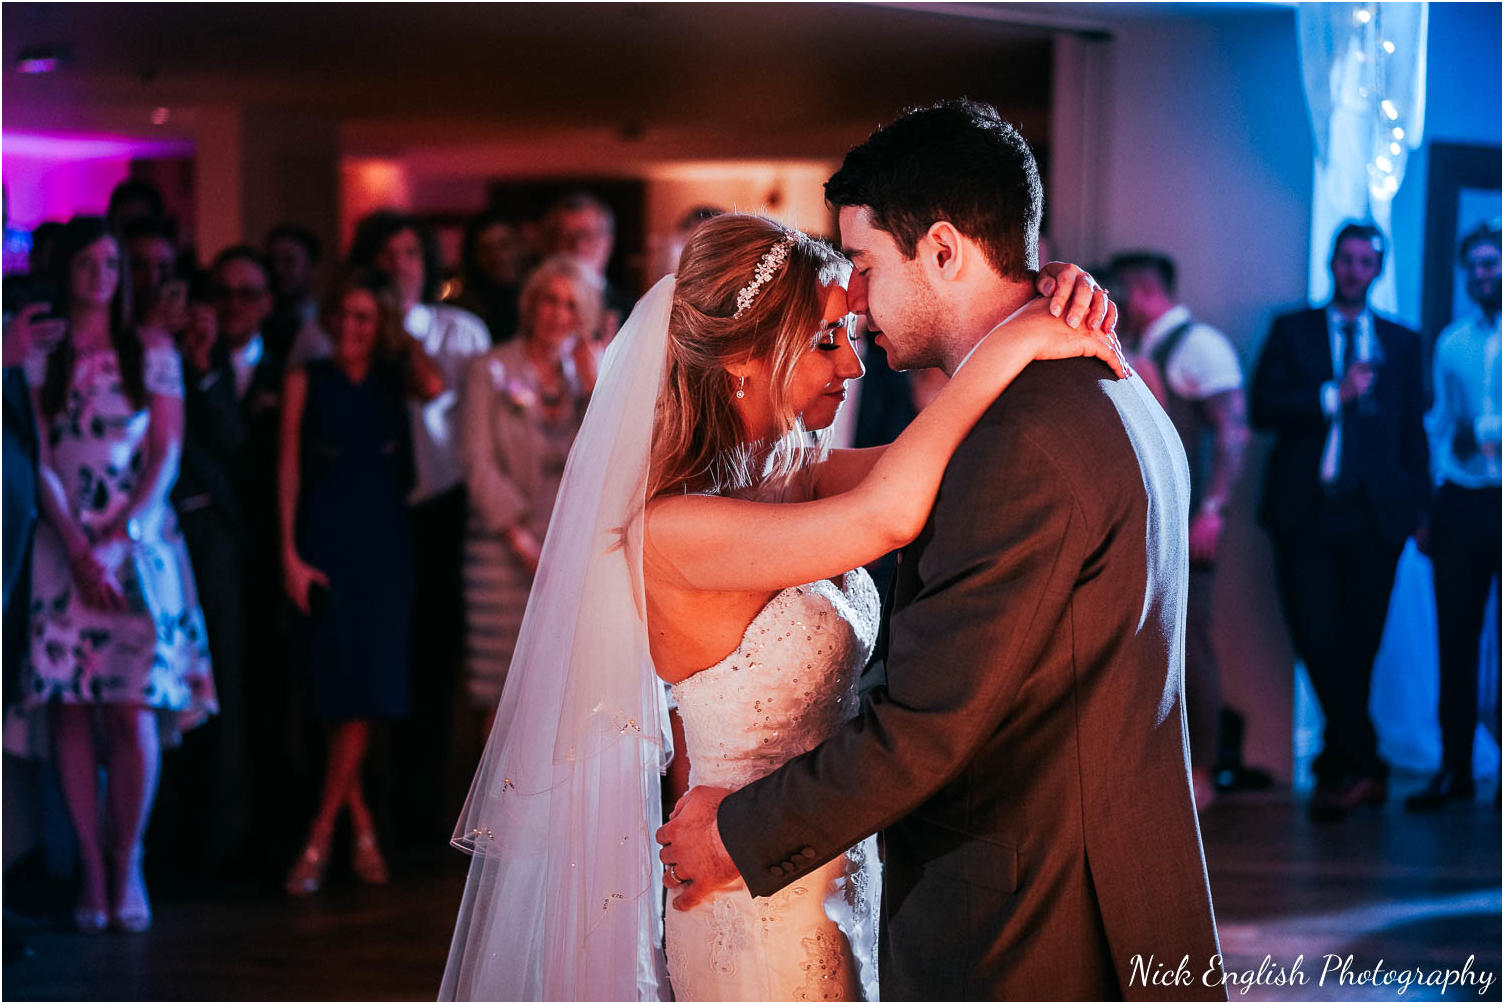 Mitton_Hall_Wedding_Photographer_2018-170.jpg